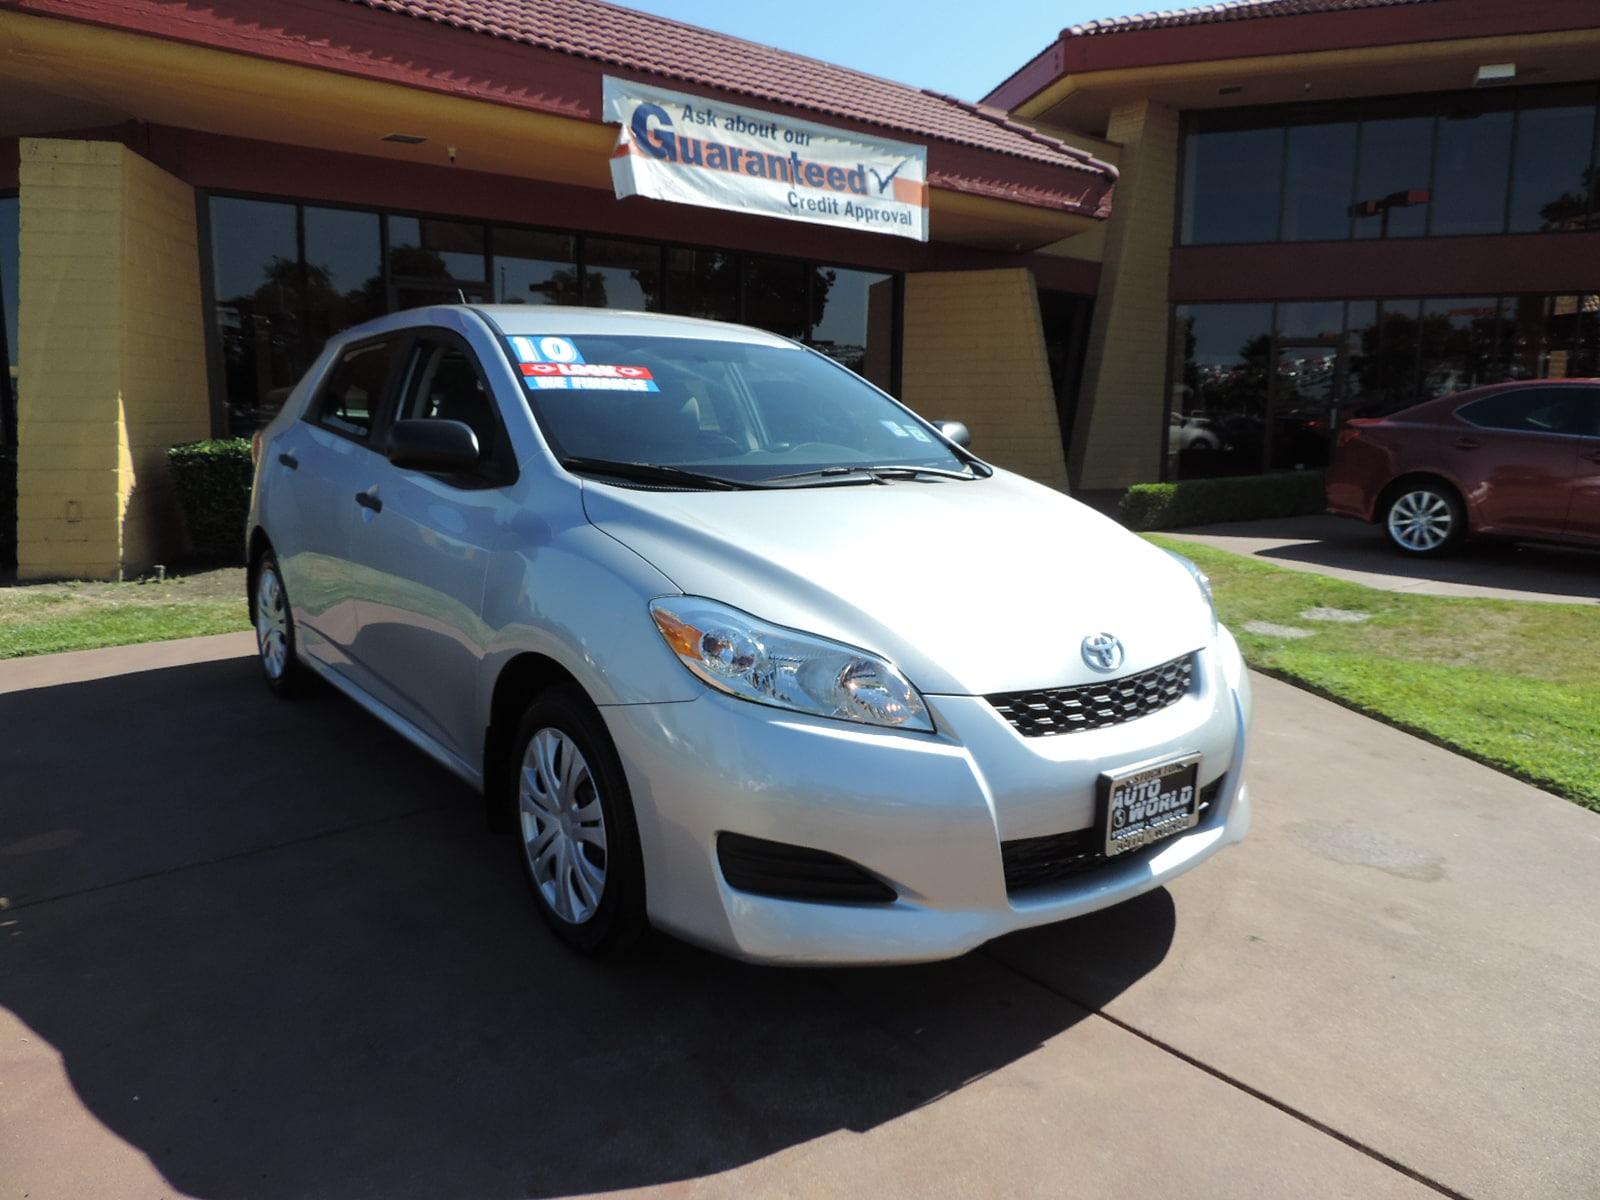 Used 2010 Toyota Matrix For Sale